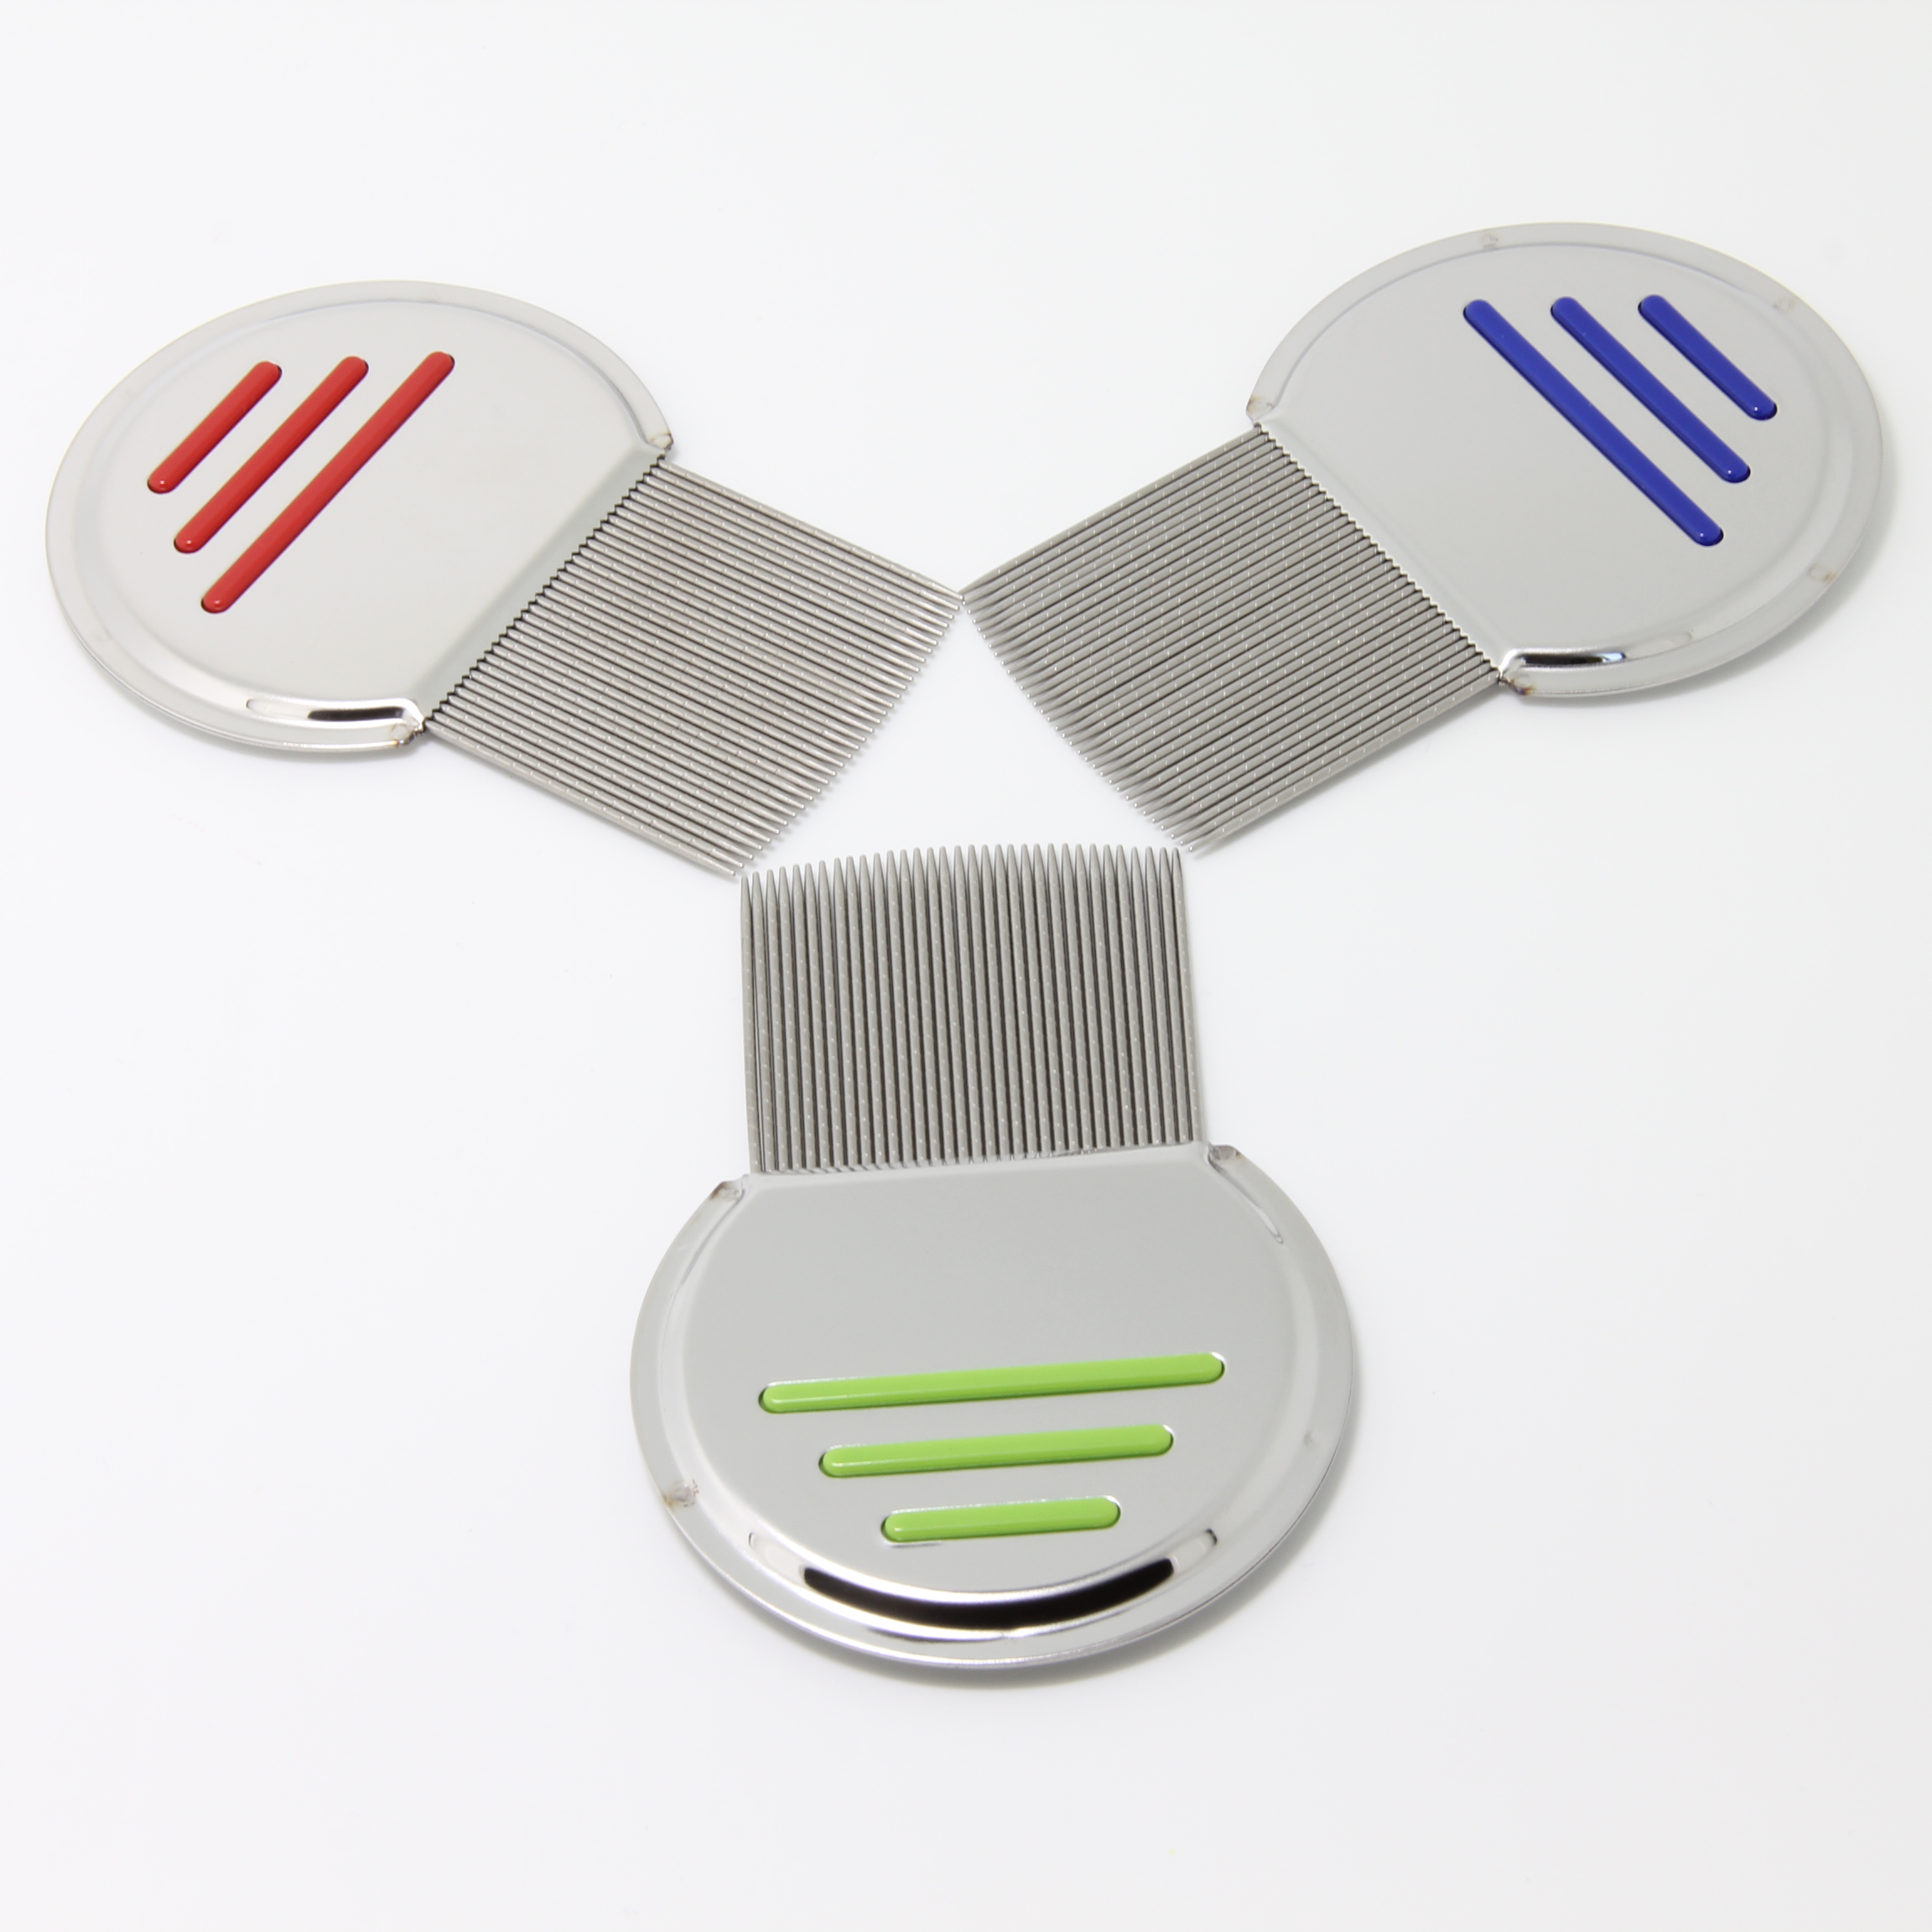 3PCS Combs set Terminator Lice Comb Nit Free Kids Hair Rid Headlice stainless steel Metal Teeth מסרק כינים